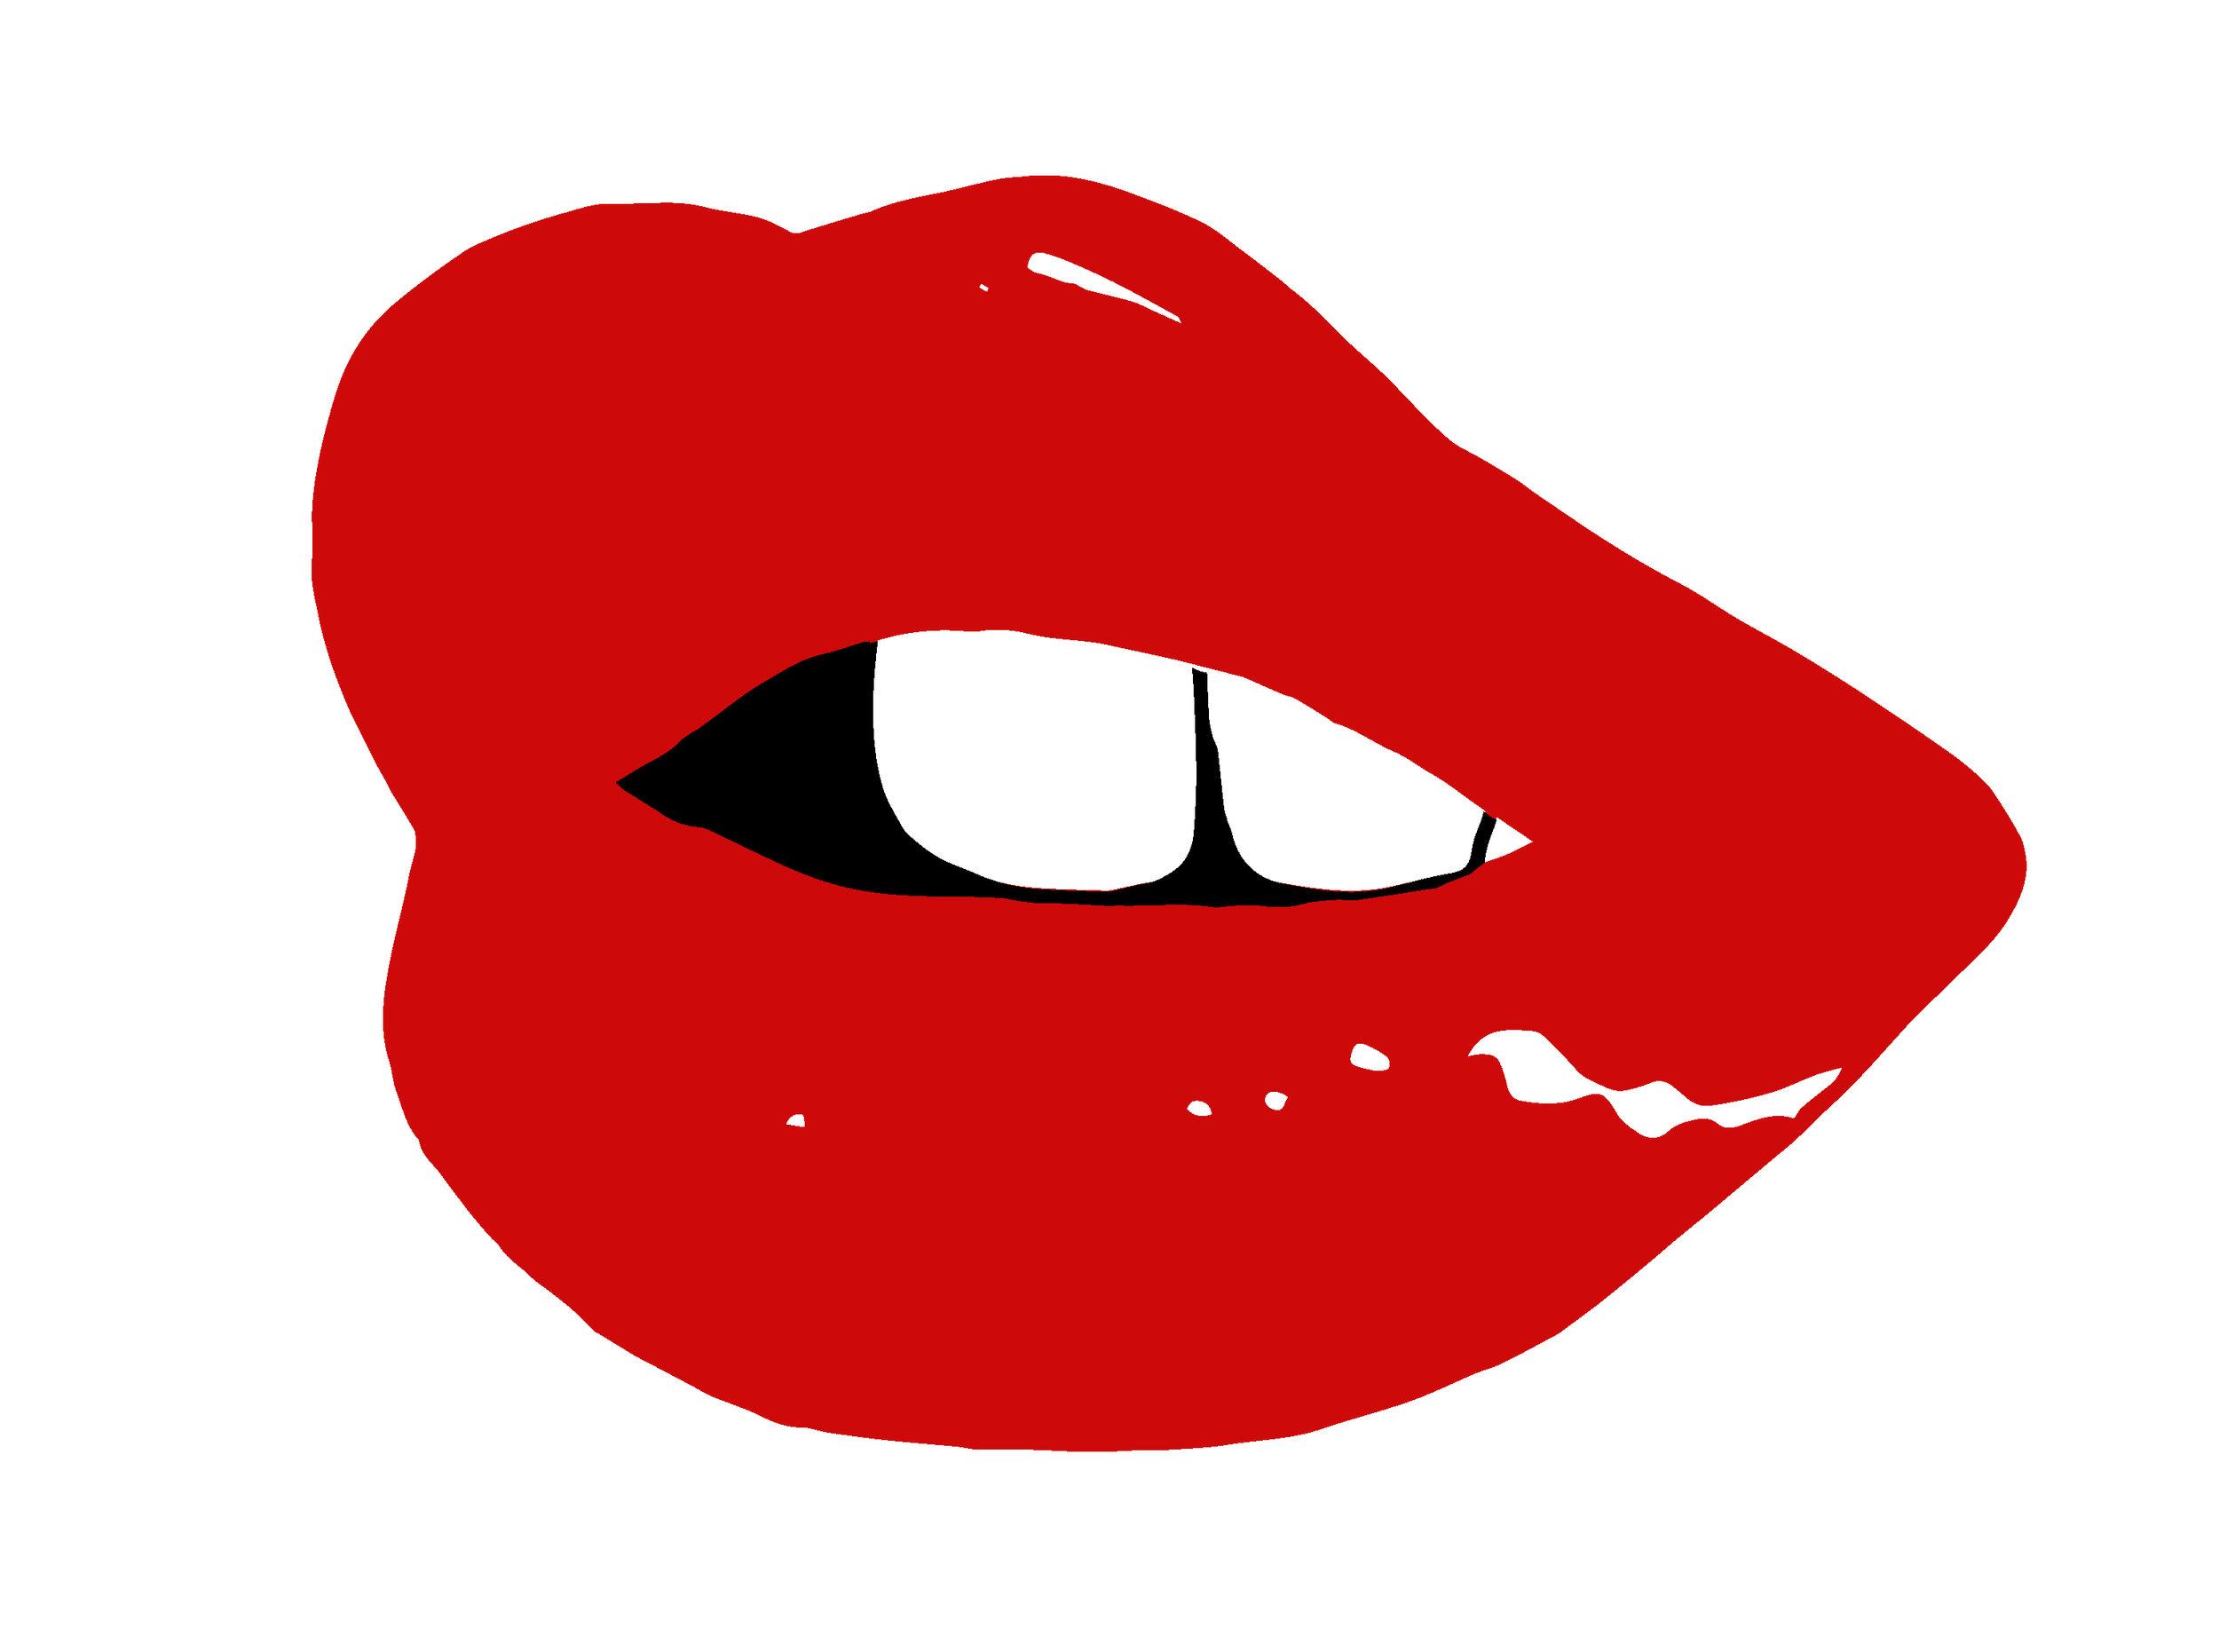 Pucker_Lips_008.jpg